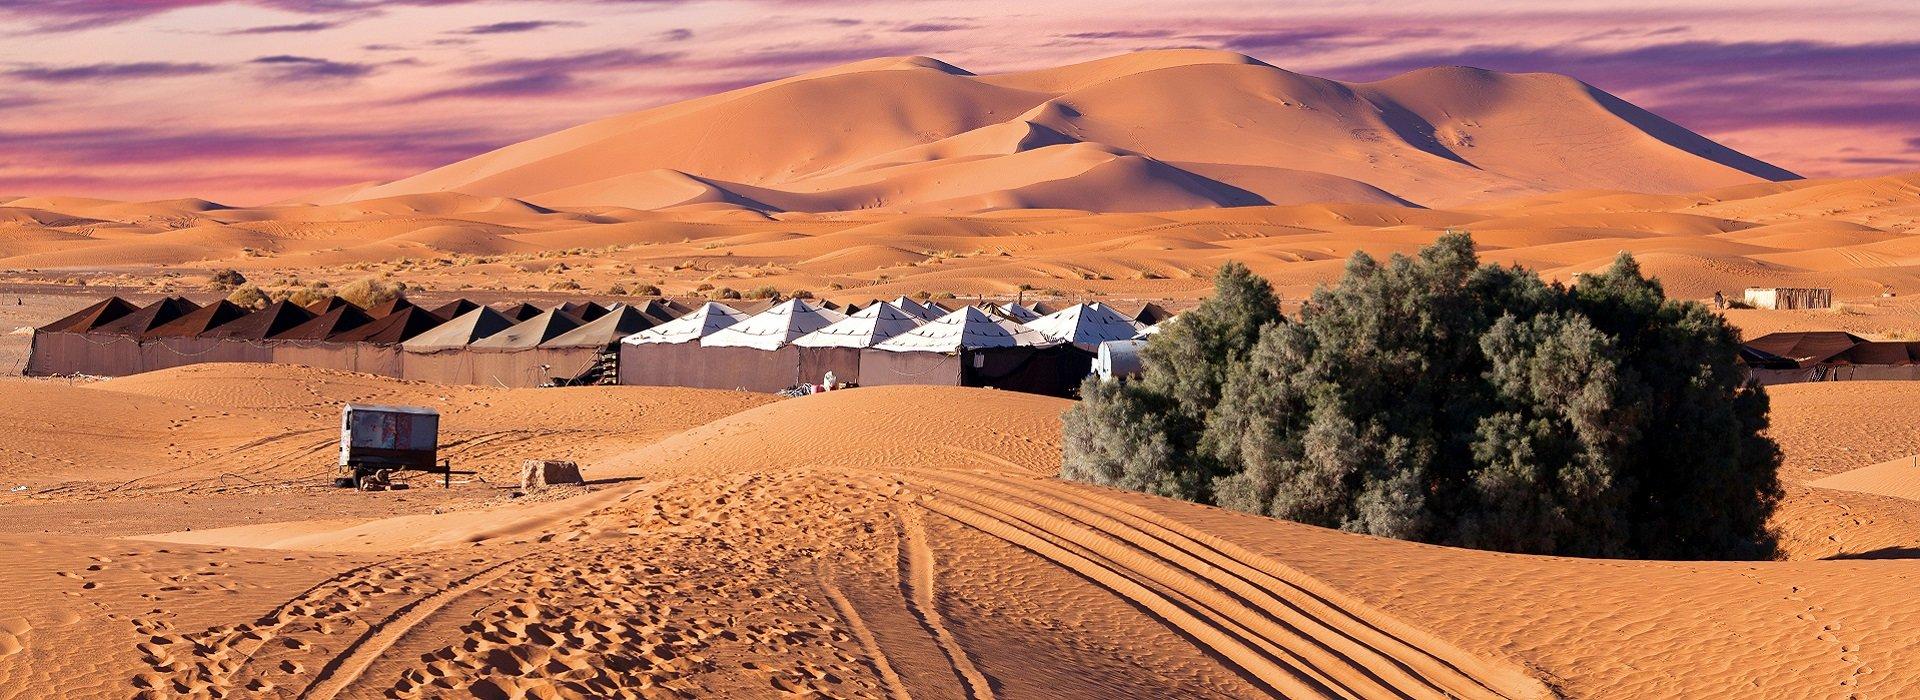 merzouga_sahara_desert_marocco